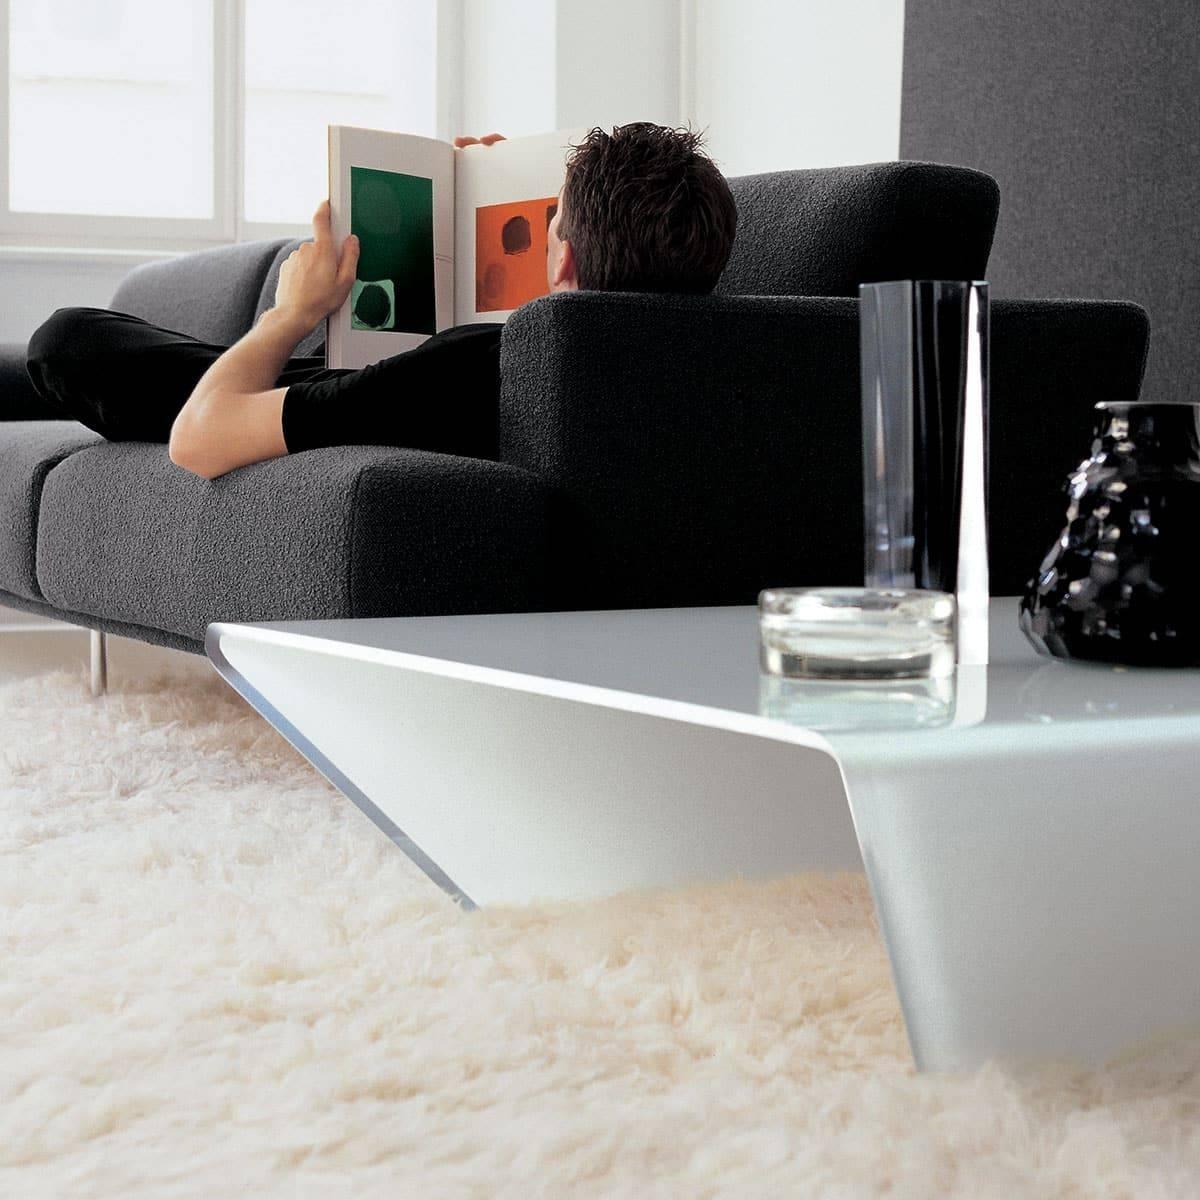 Rubino Curved Glass Coffee Table - Klarity - Glass Furniture in Curved Glass Coffee Tables (Image 24 of 30)